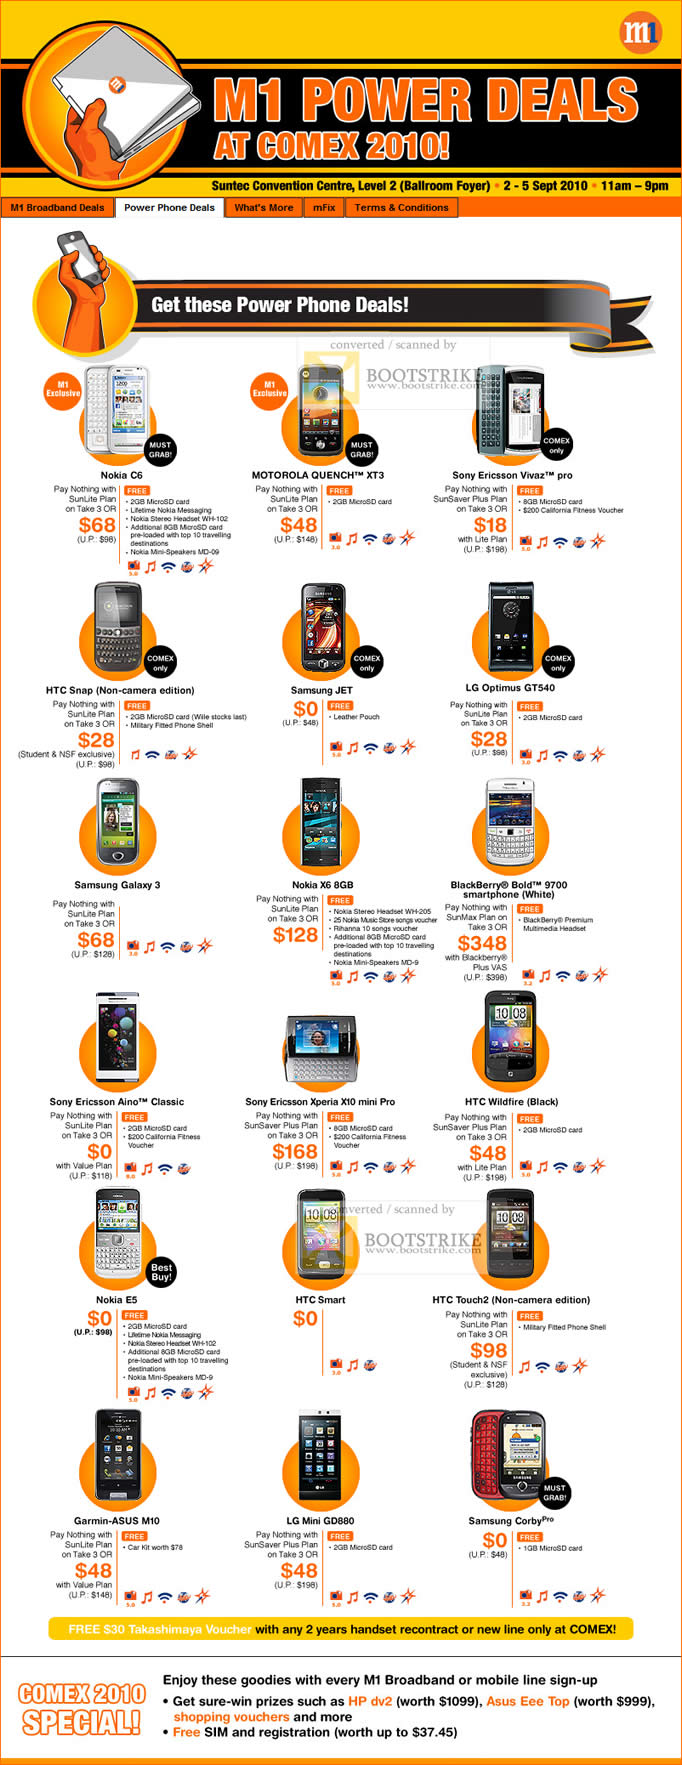 Comex 2010 price list image brochure of M1 Mobile Power Phone Nokia Motorola Quench XT3 Sony Ericsson HTC Samsung LG Blackberry Bold Garmin ASUS